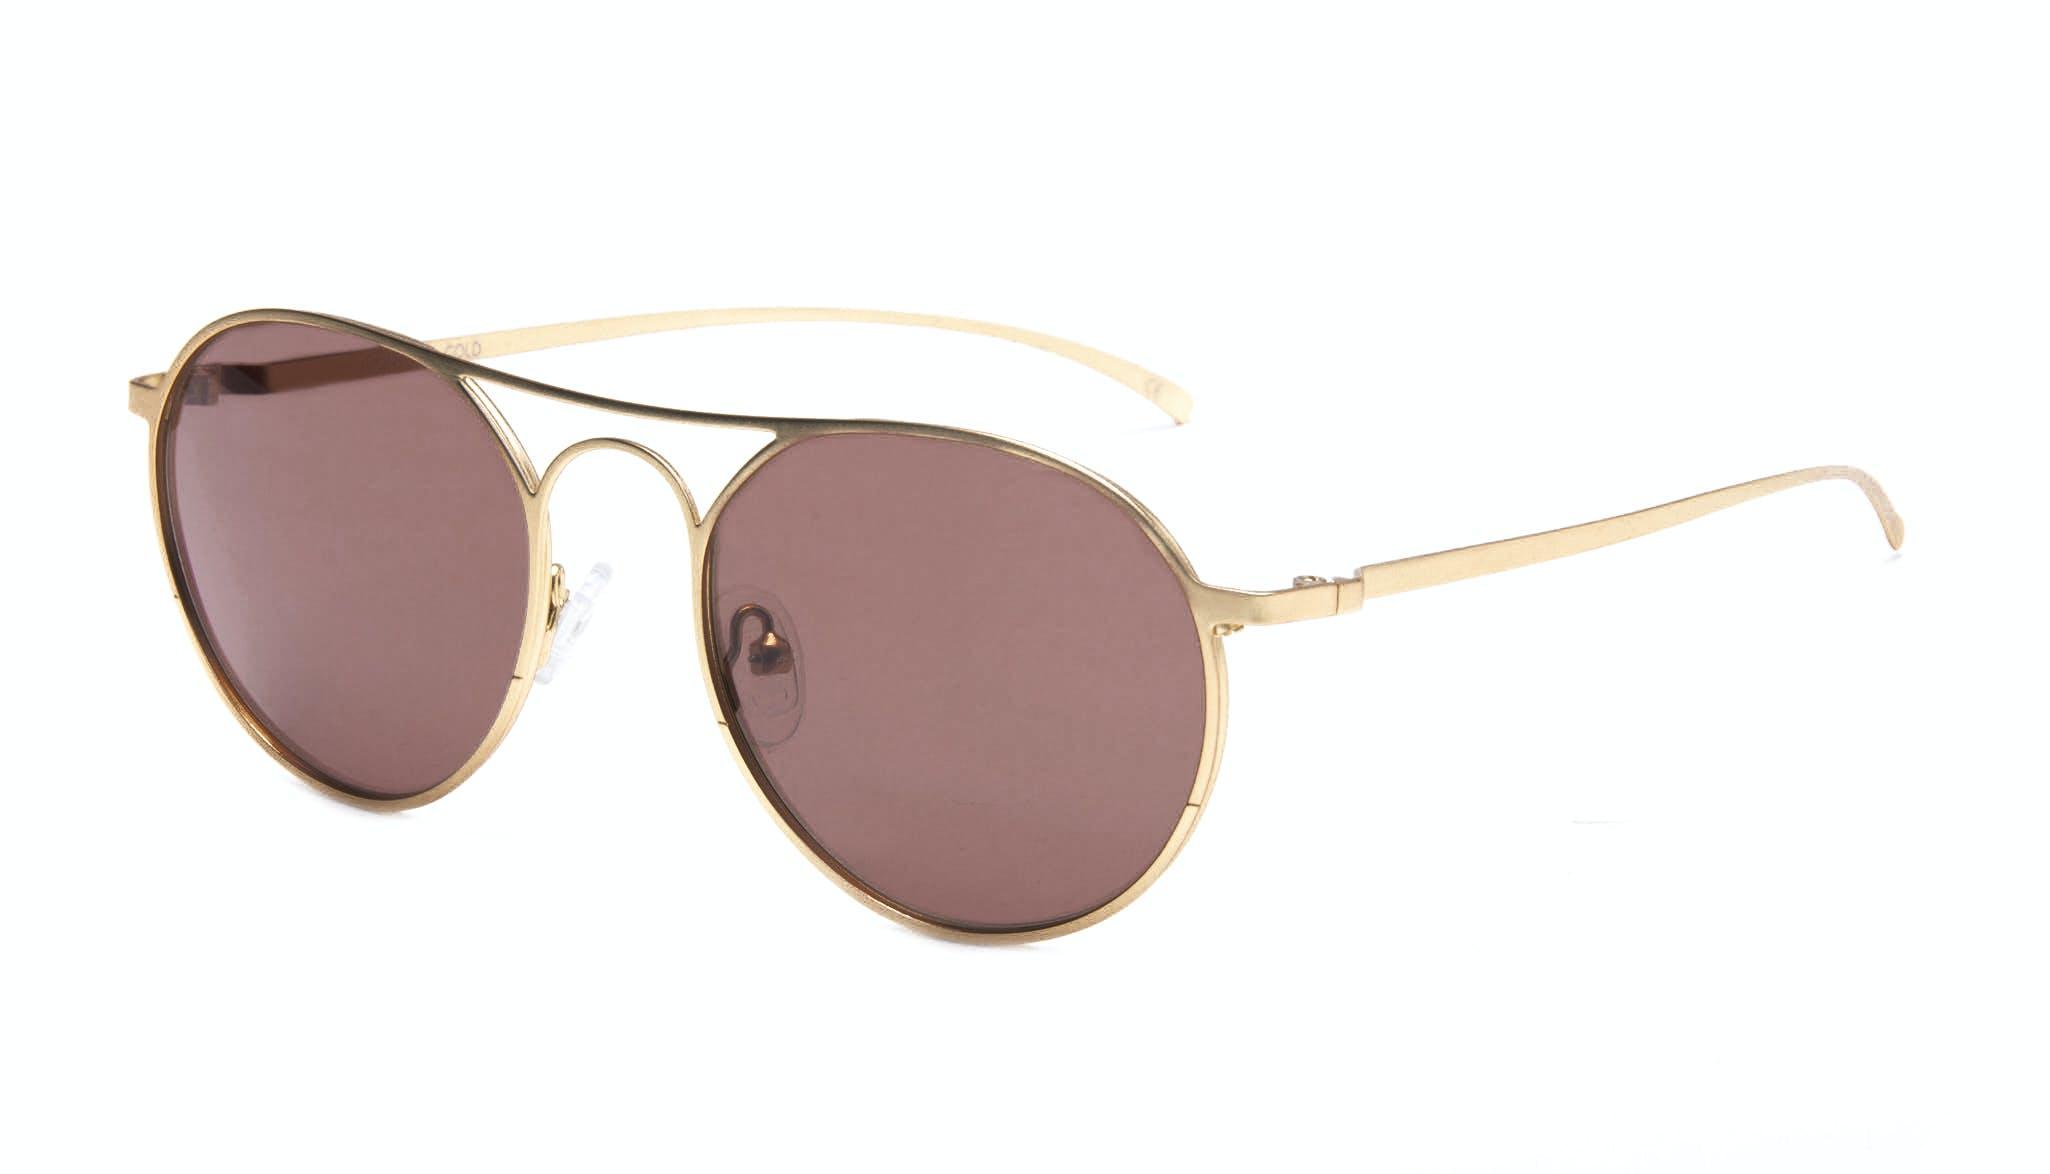 Affordable Fashion Glasses Aviator Round Sunglasses Men Contour Gold Tilt